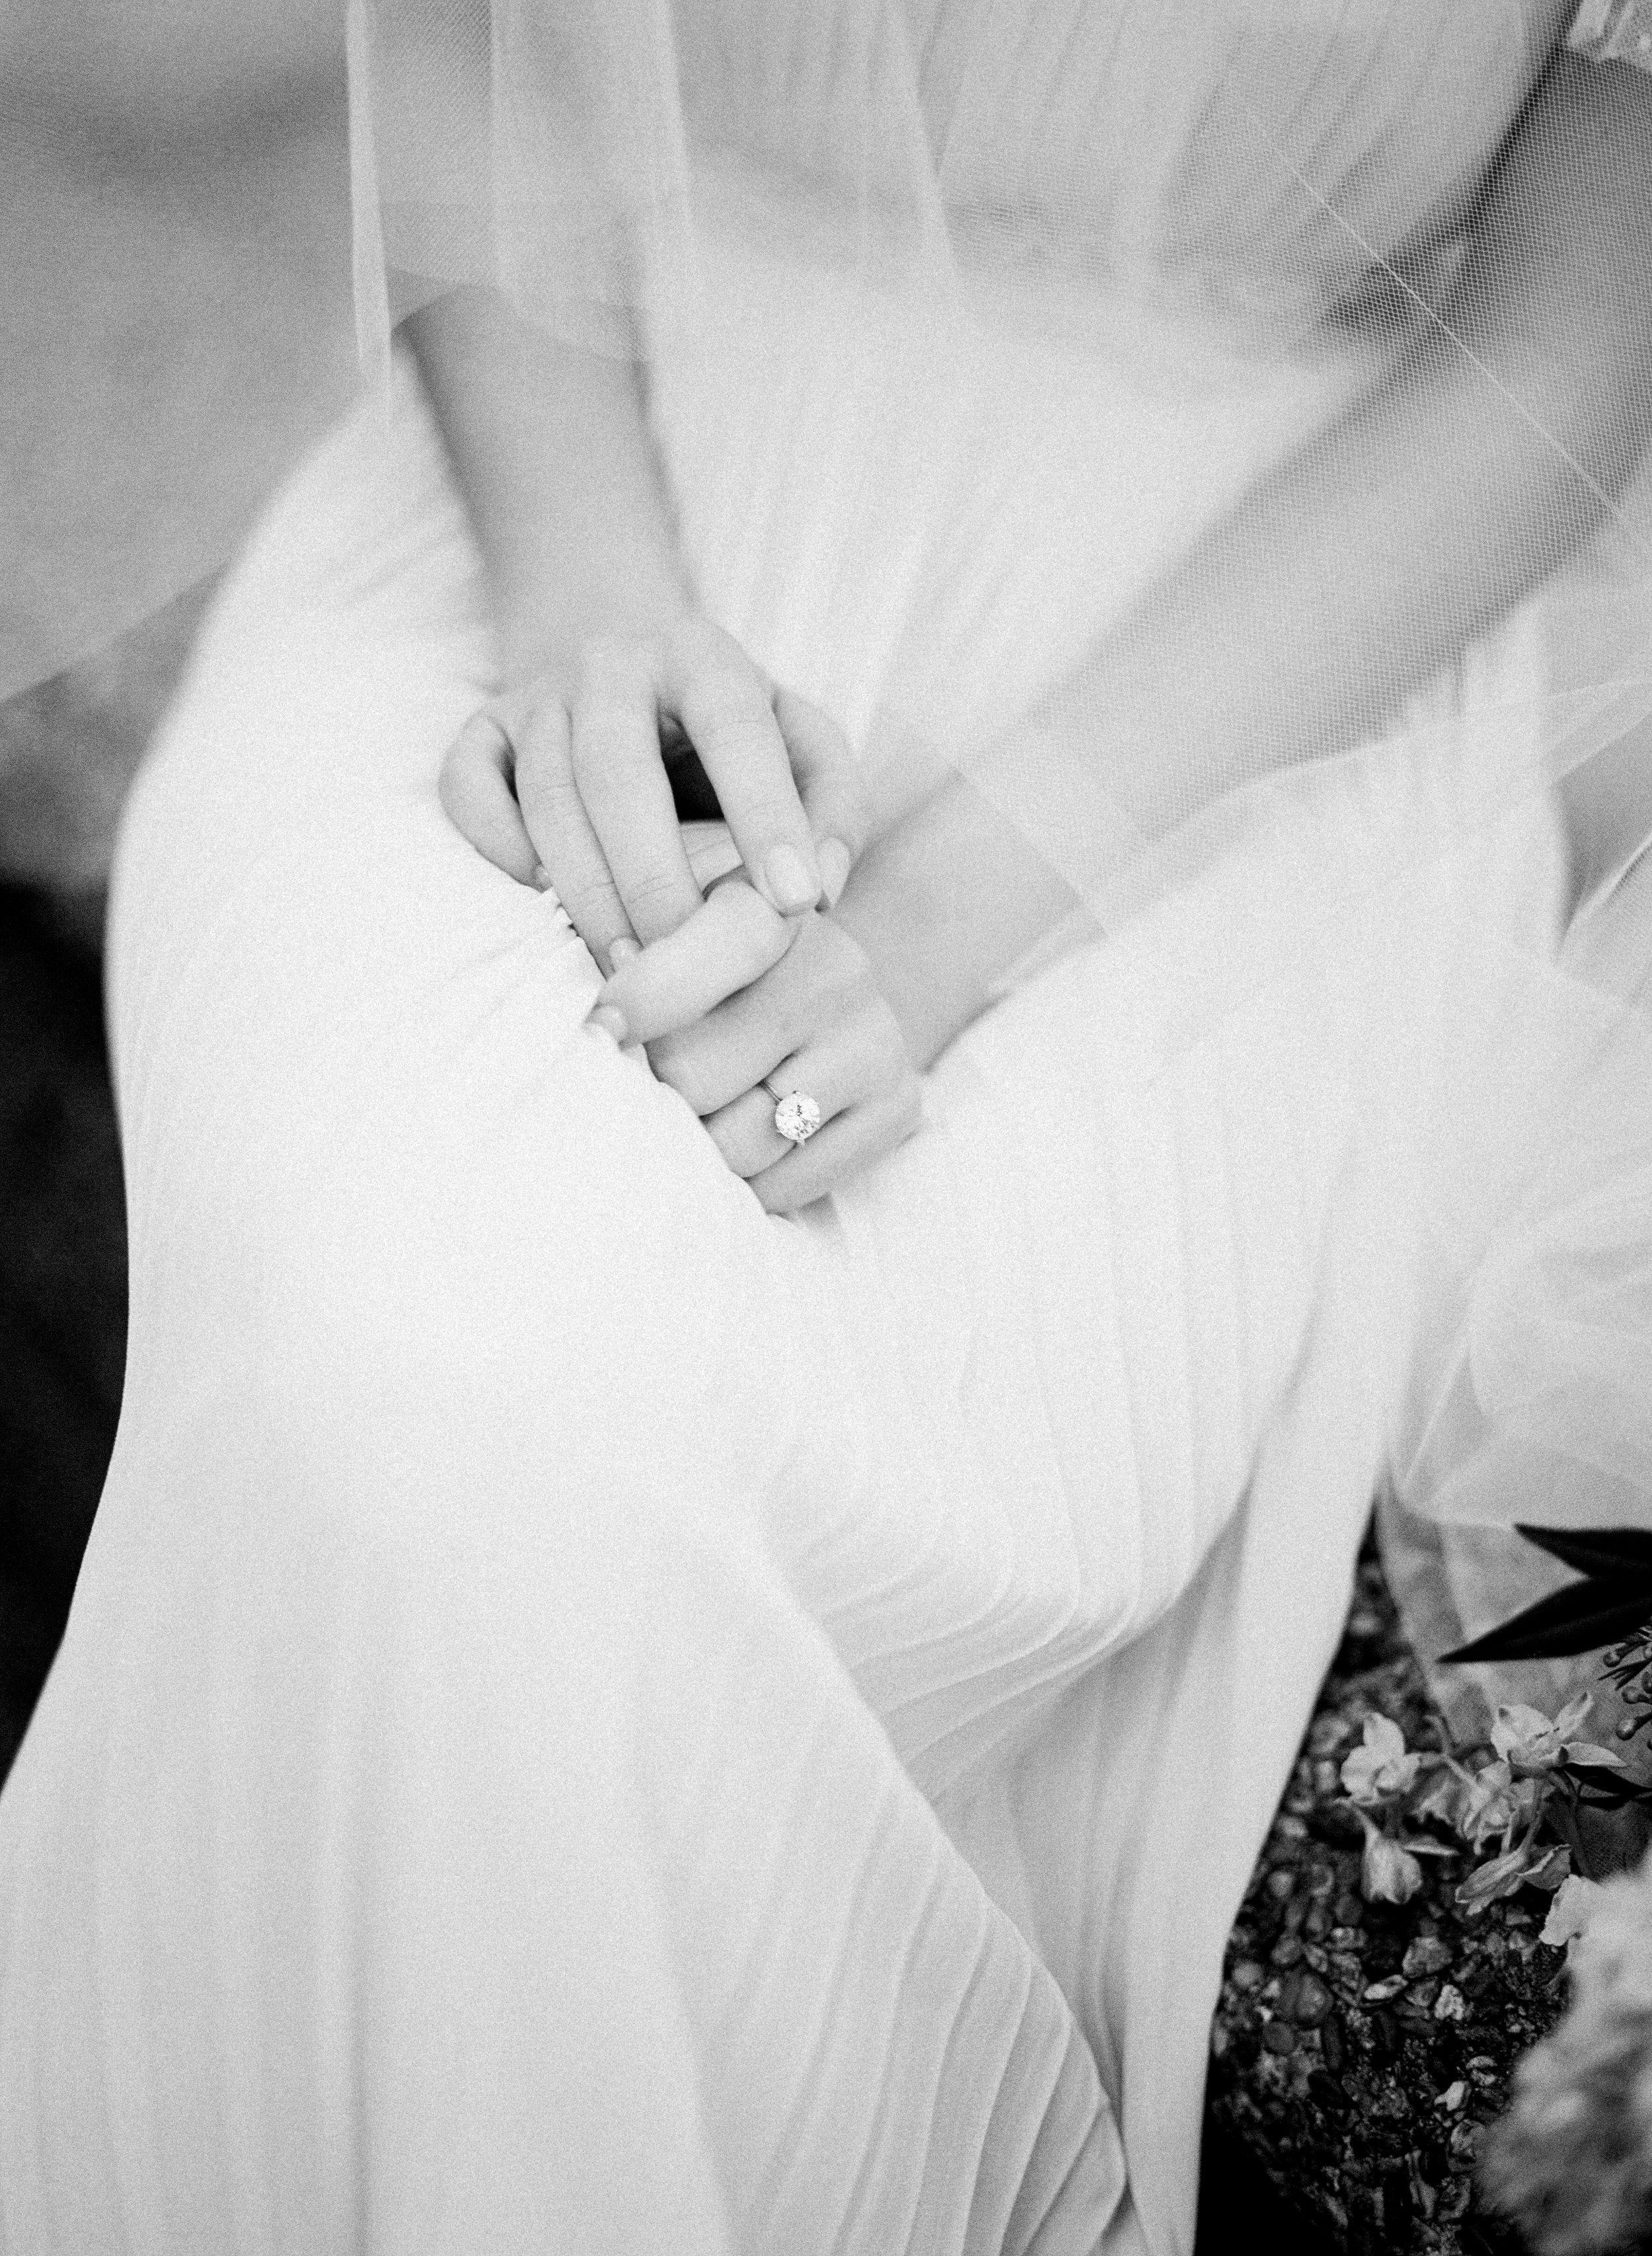 susie-saltzman-solitaire-engagement-rings